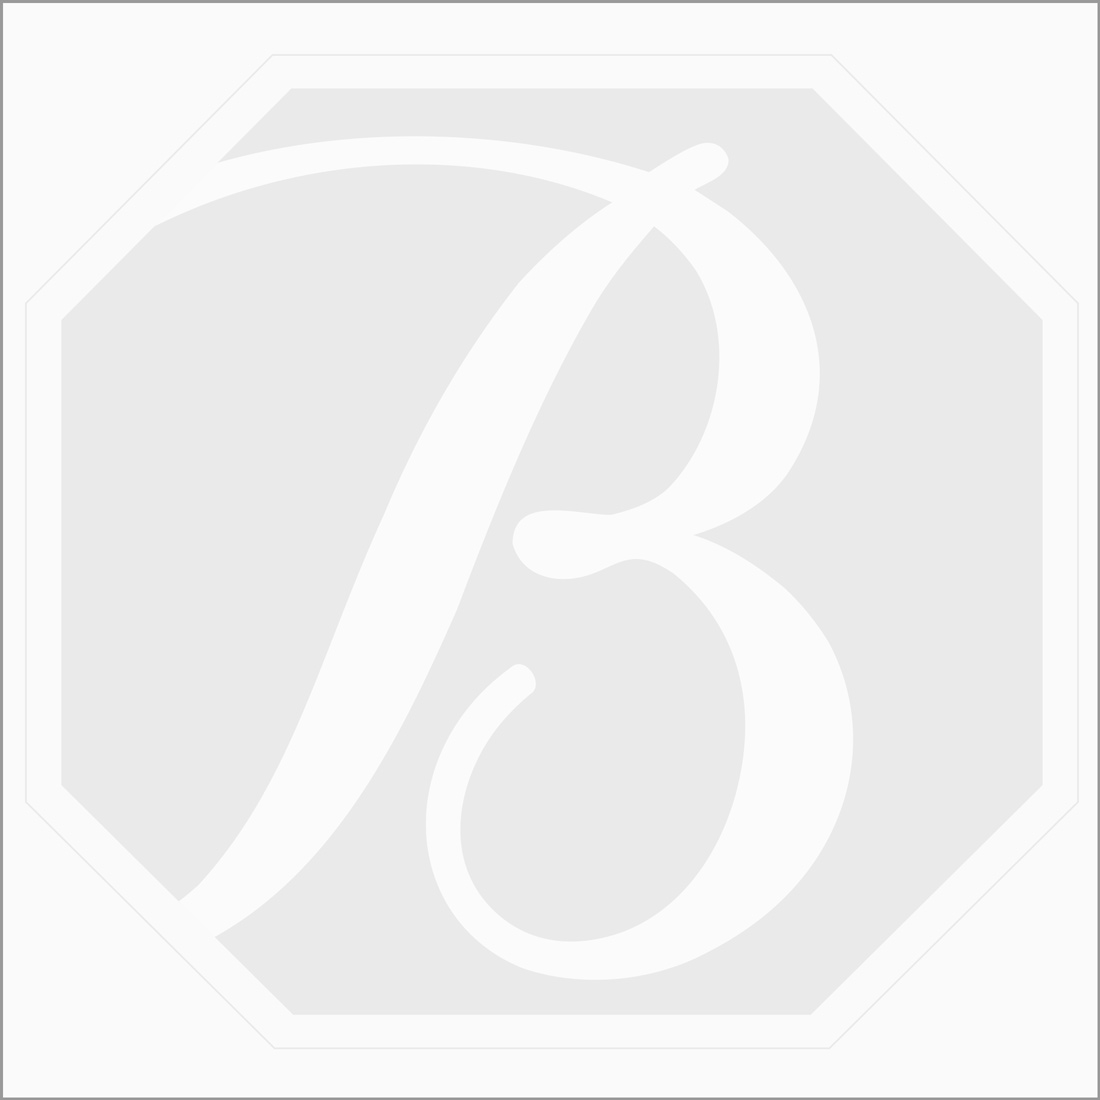 6 Pcs - 10.24 ct. -Medium Blue Aquamarine Oval Cabochon - 8 x 6.1 x 4 mm to 9.2 x 7.2 x 4.3 mm (AQCAB1064)